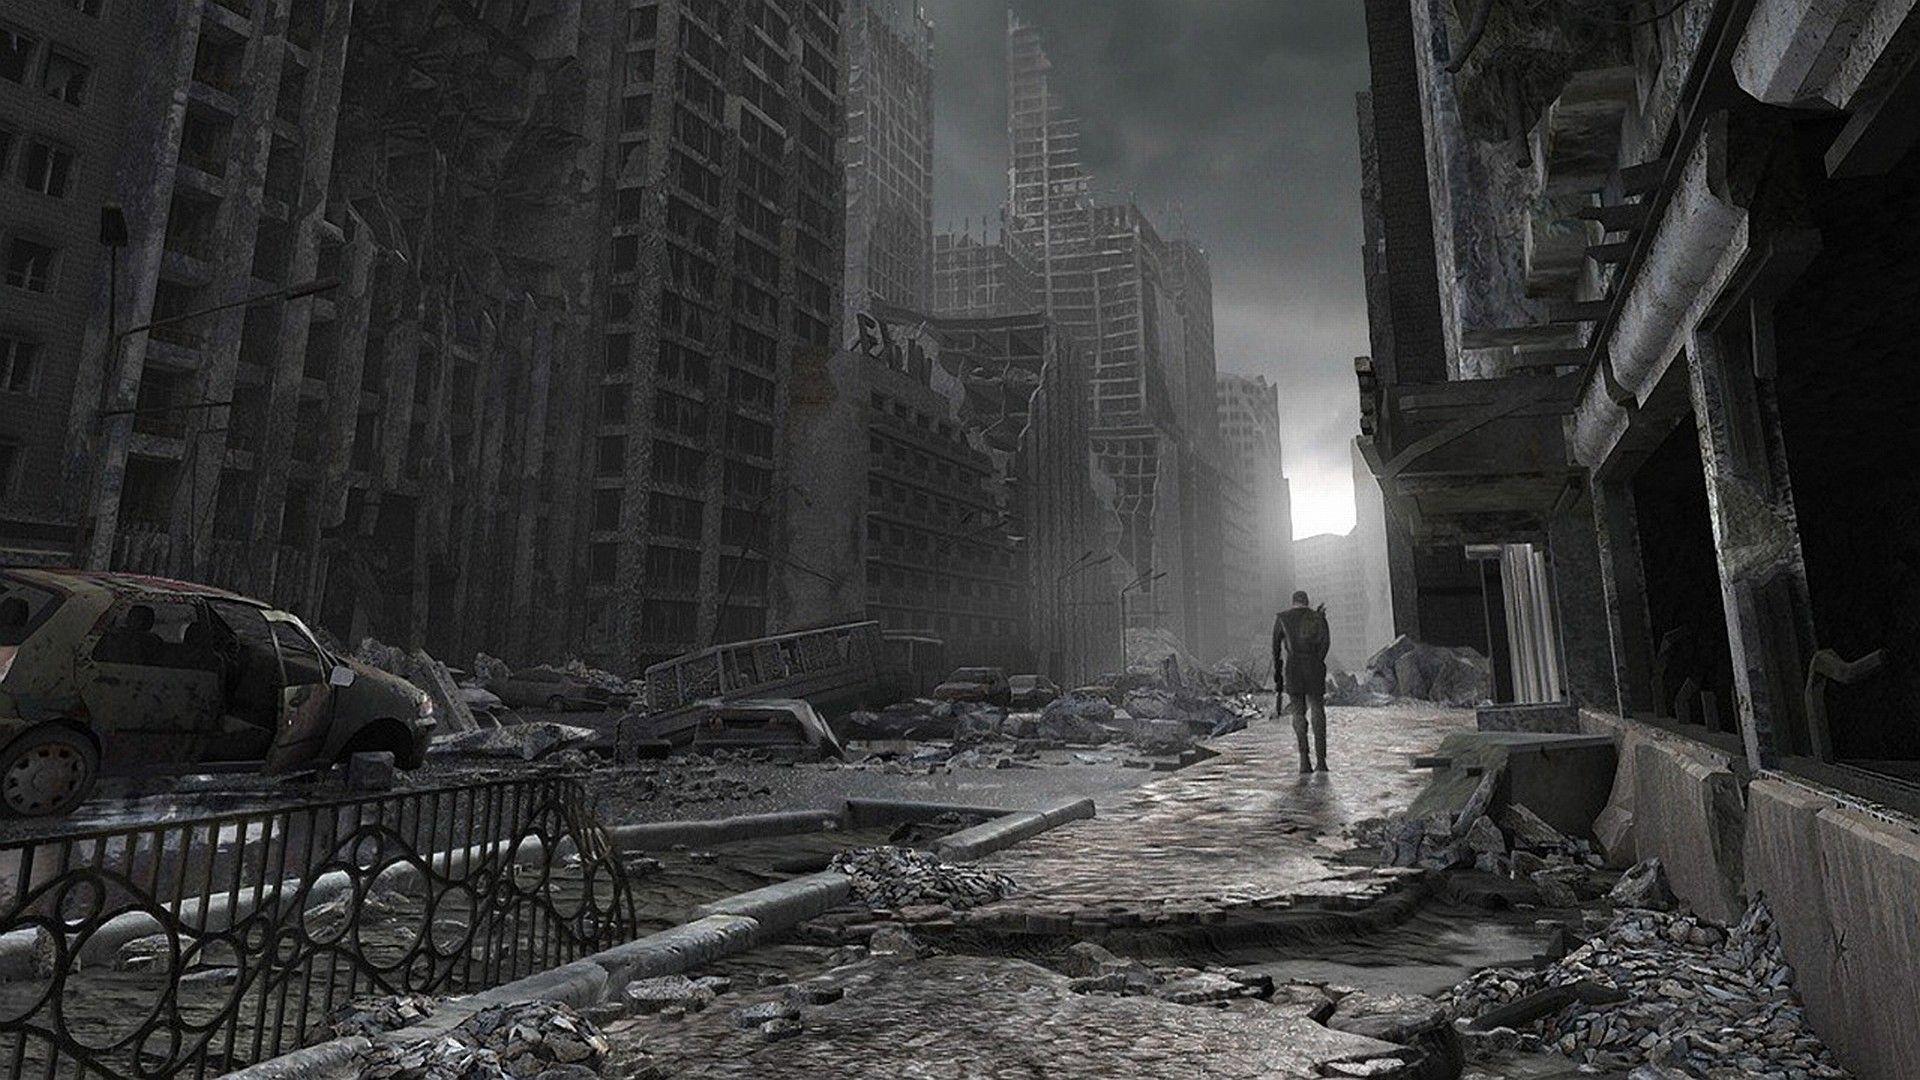 Apocalyptic Desktop Wallpapers Top Free Apocalyptic